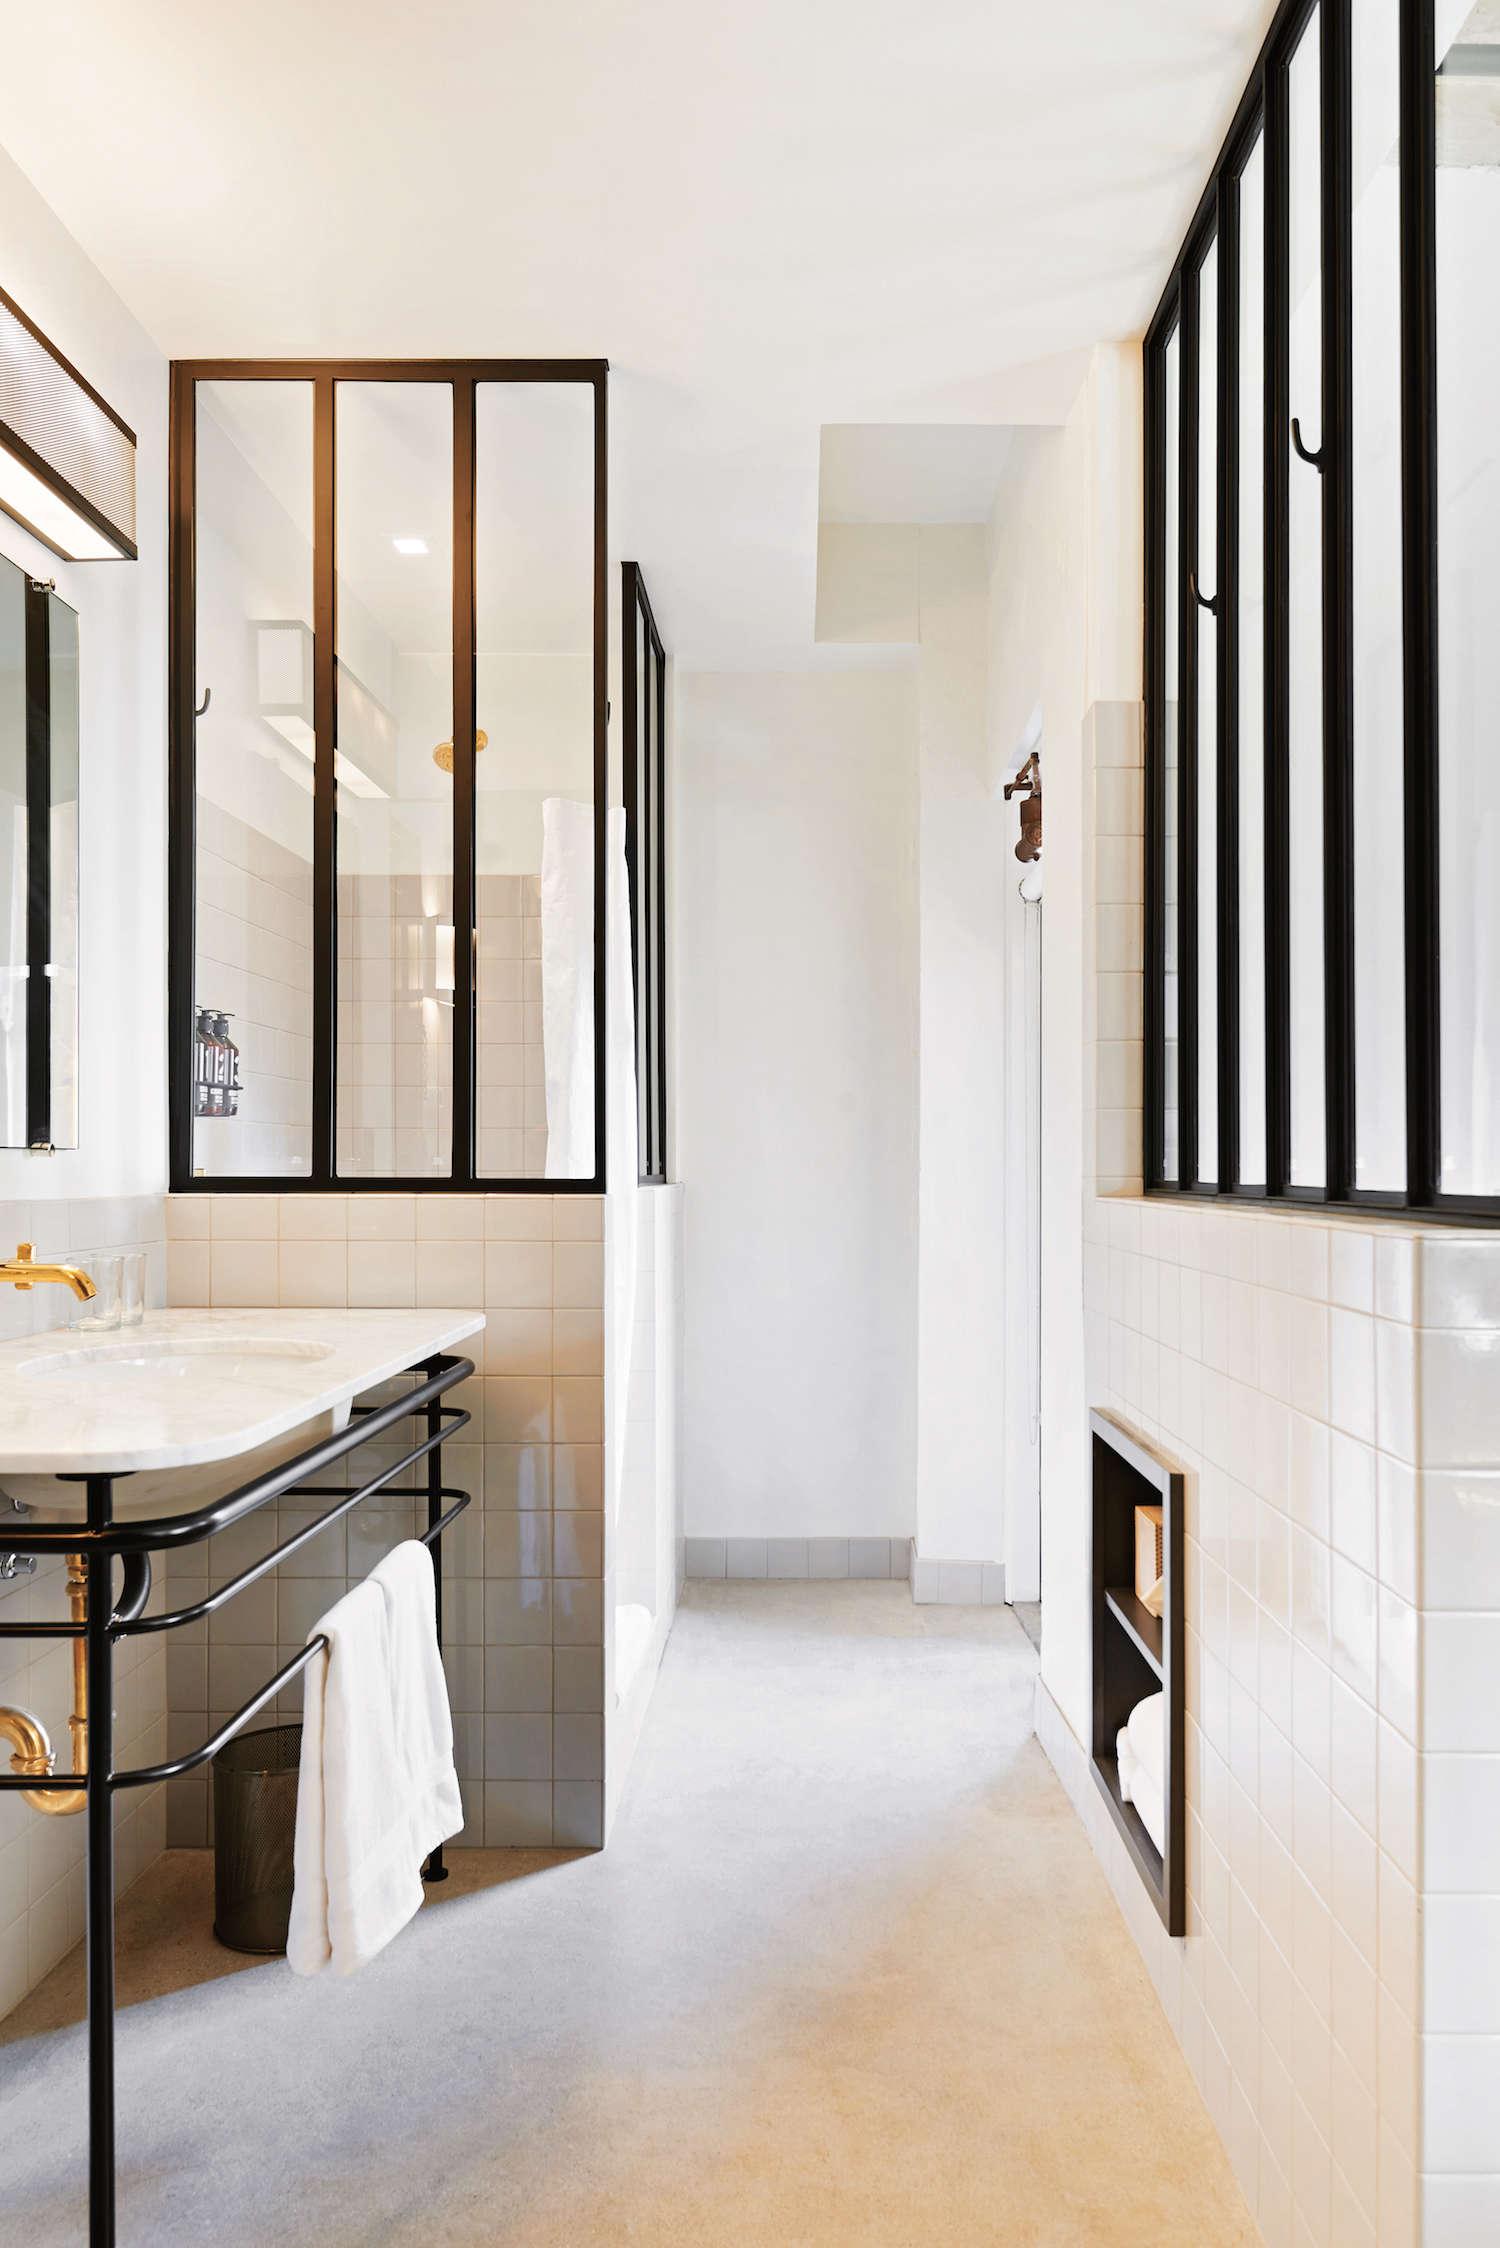 white-bathroom-with-black-steel-interior-windows